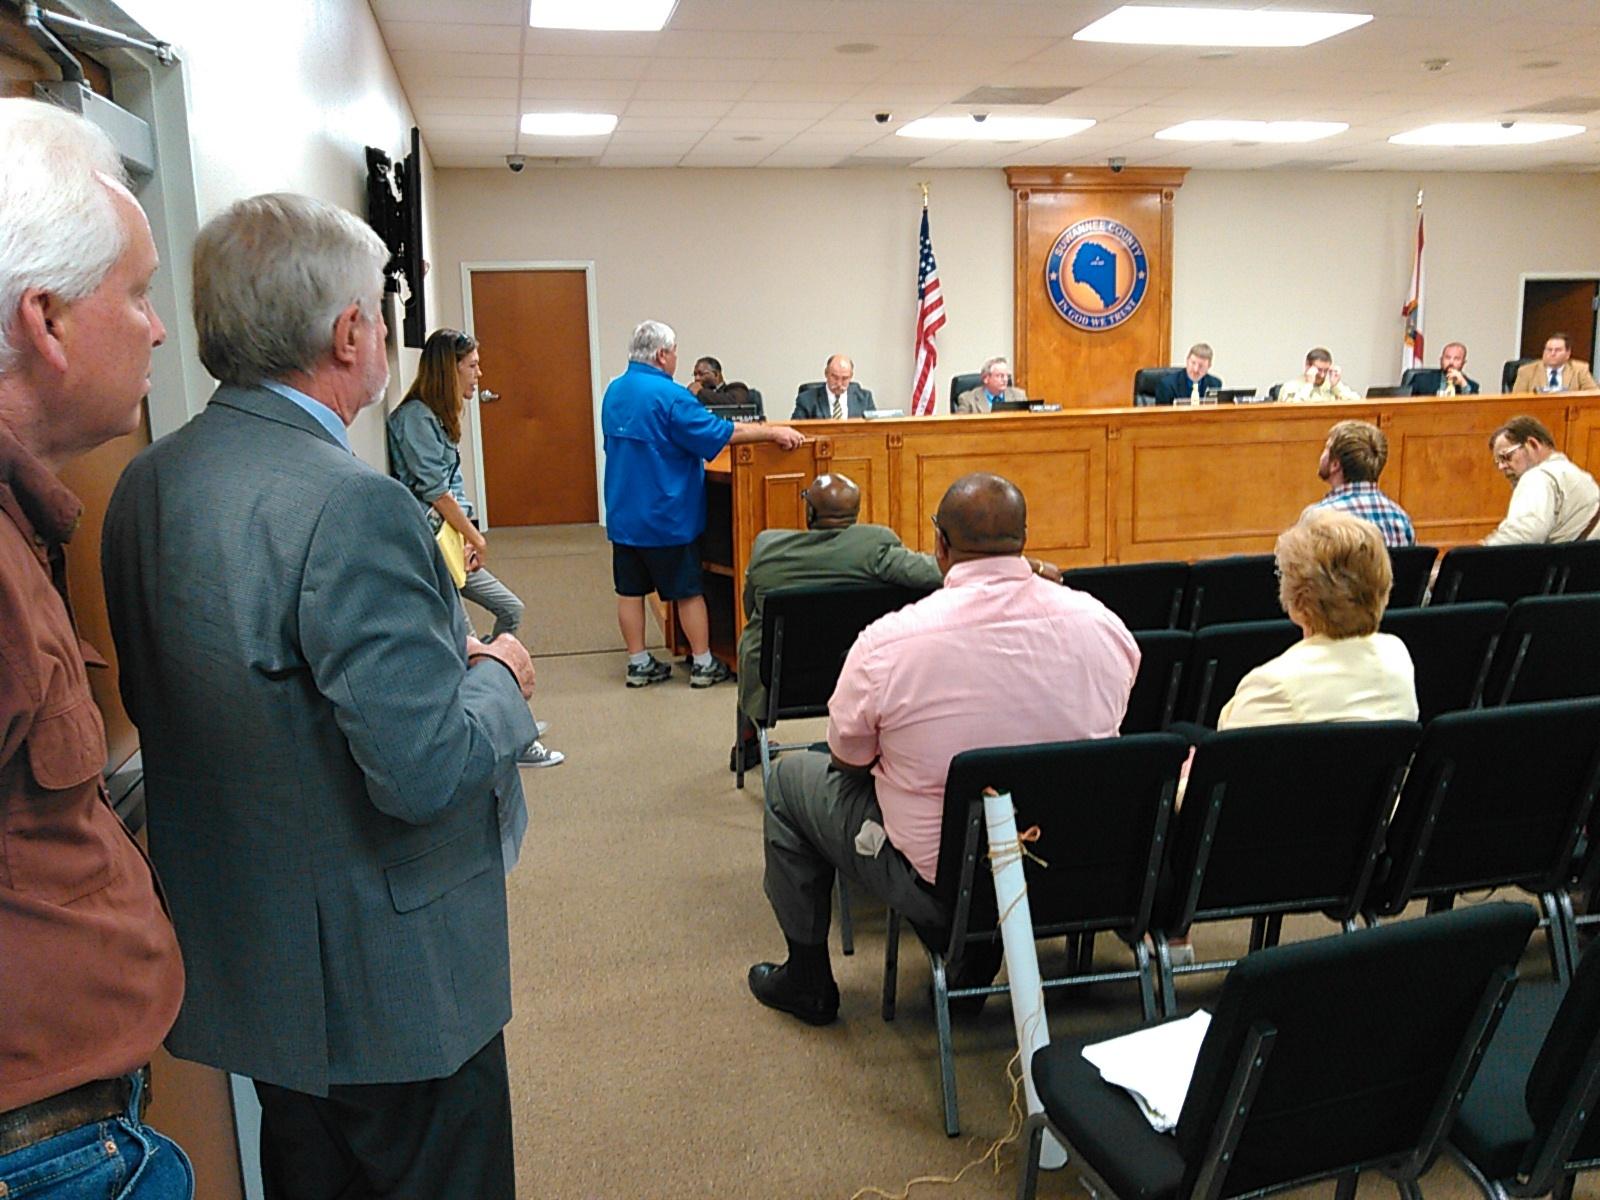 1600x1200 Speakers Chris Mericle, Jim Tatum, Debra Johnson, Wayne Ellison, in Suwannee BOCC votes 4:1 to ask Army Corps of Engineers to investigate Sabal Trail, by John S. Quarterman, for WWALS.net, 5 April 2016